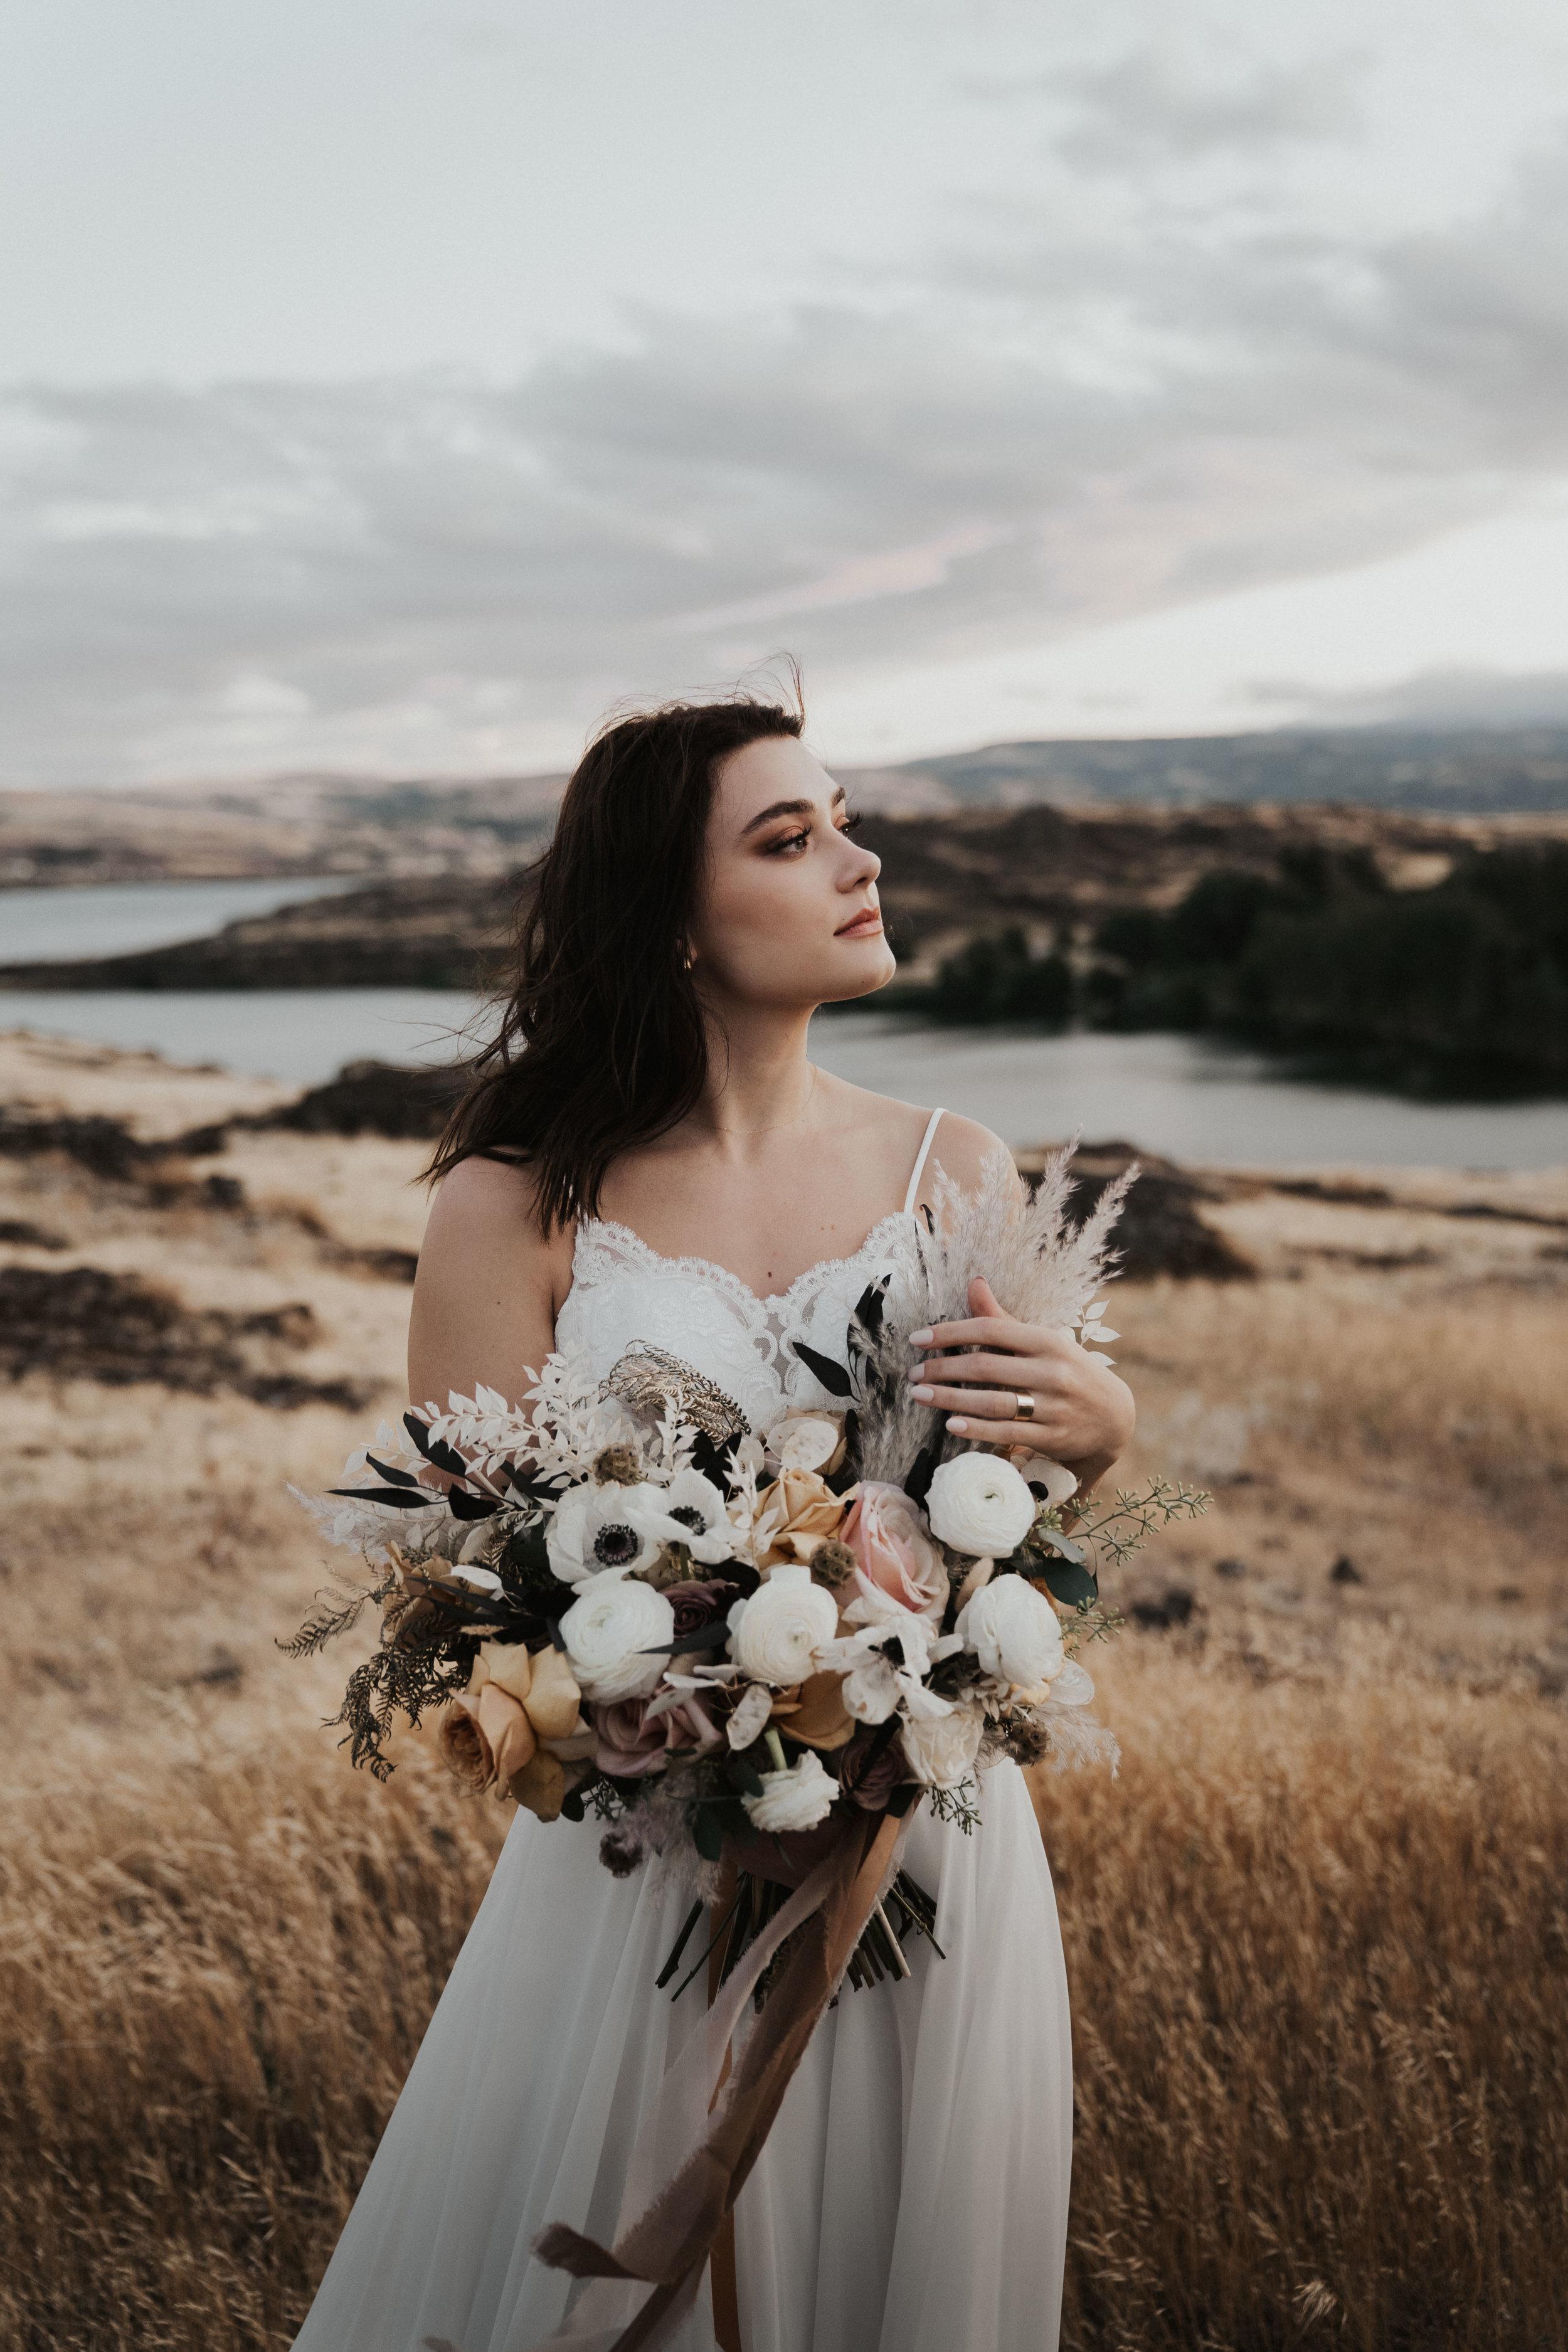 columbia-river-gorge-wedding-elopement-inspiration-39.jpg